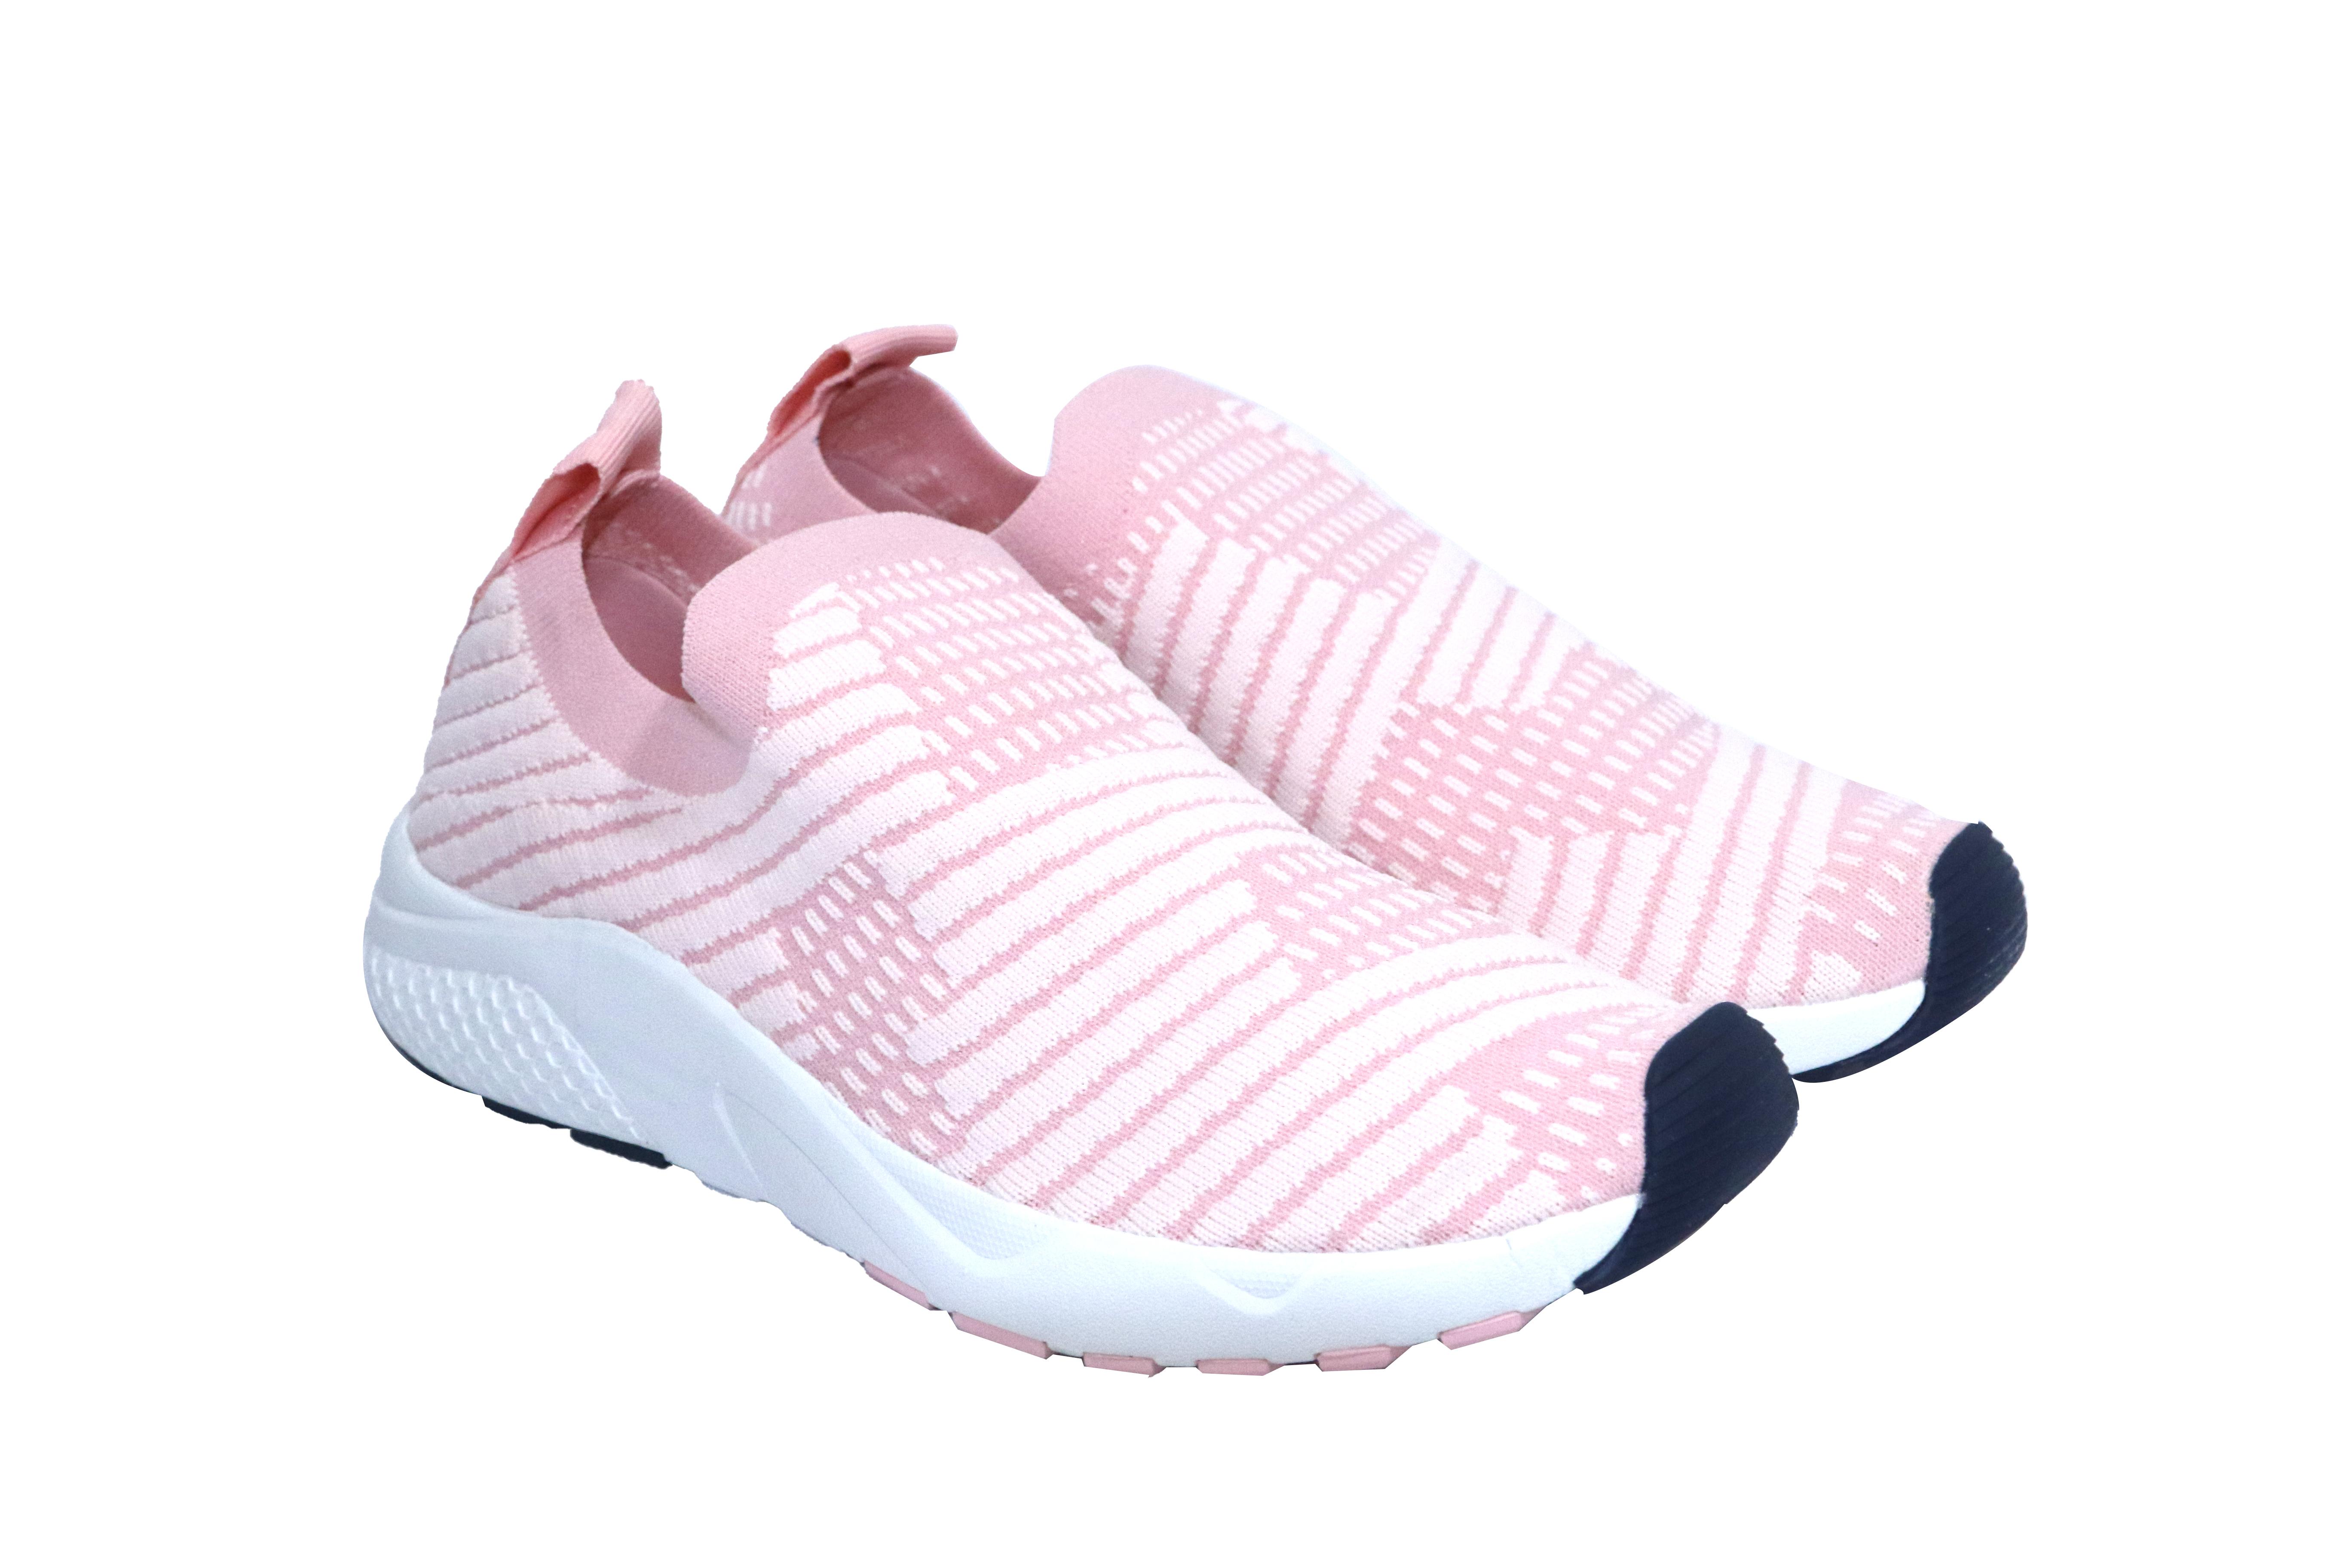 Lotto | Lotto Women's Breeze Sock W Cherub Pink/Strawberry Pink Training Shoes